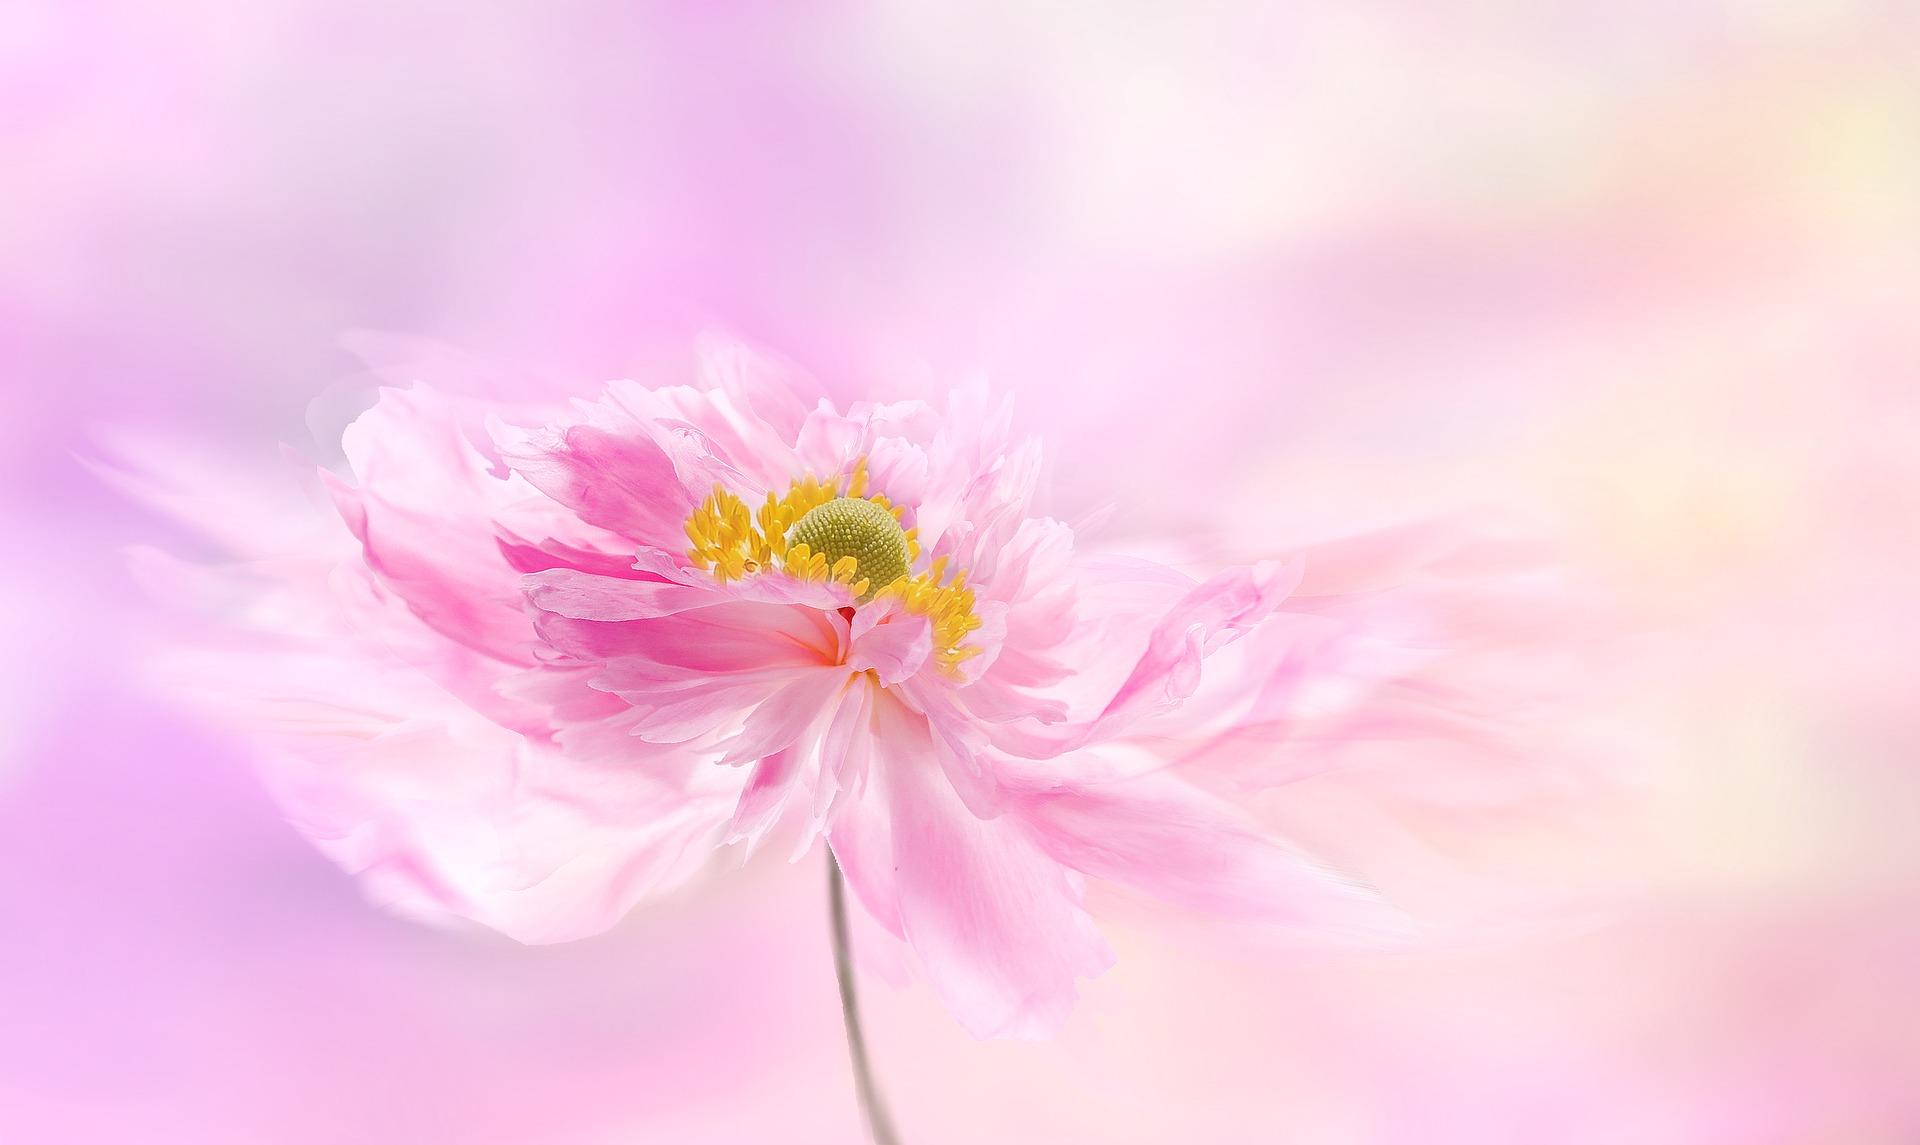 anemone-3527401_1920